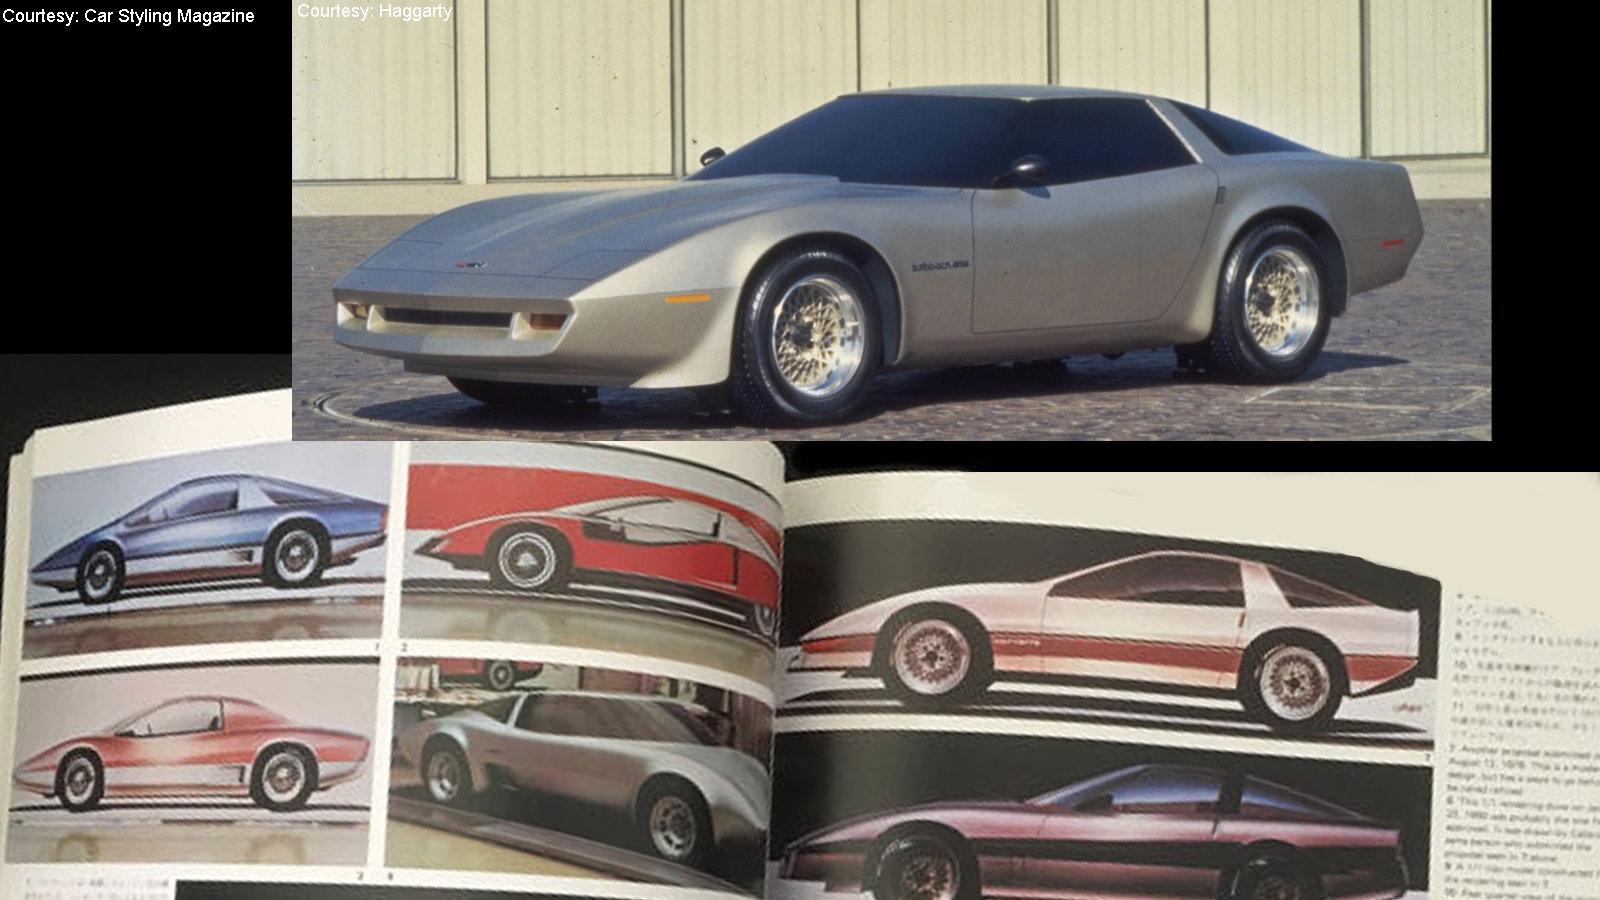 An Alternate Universe's Corvette C4